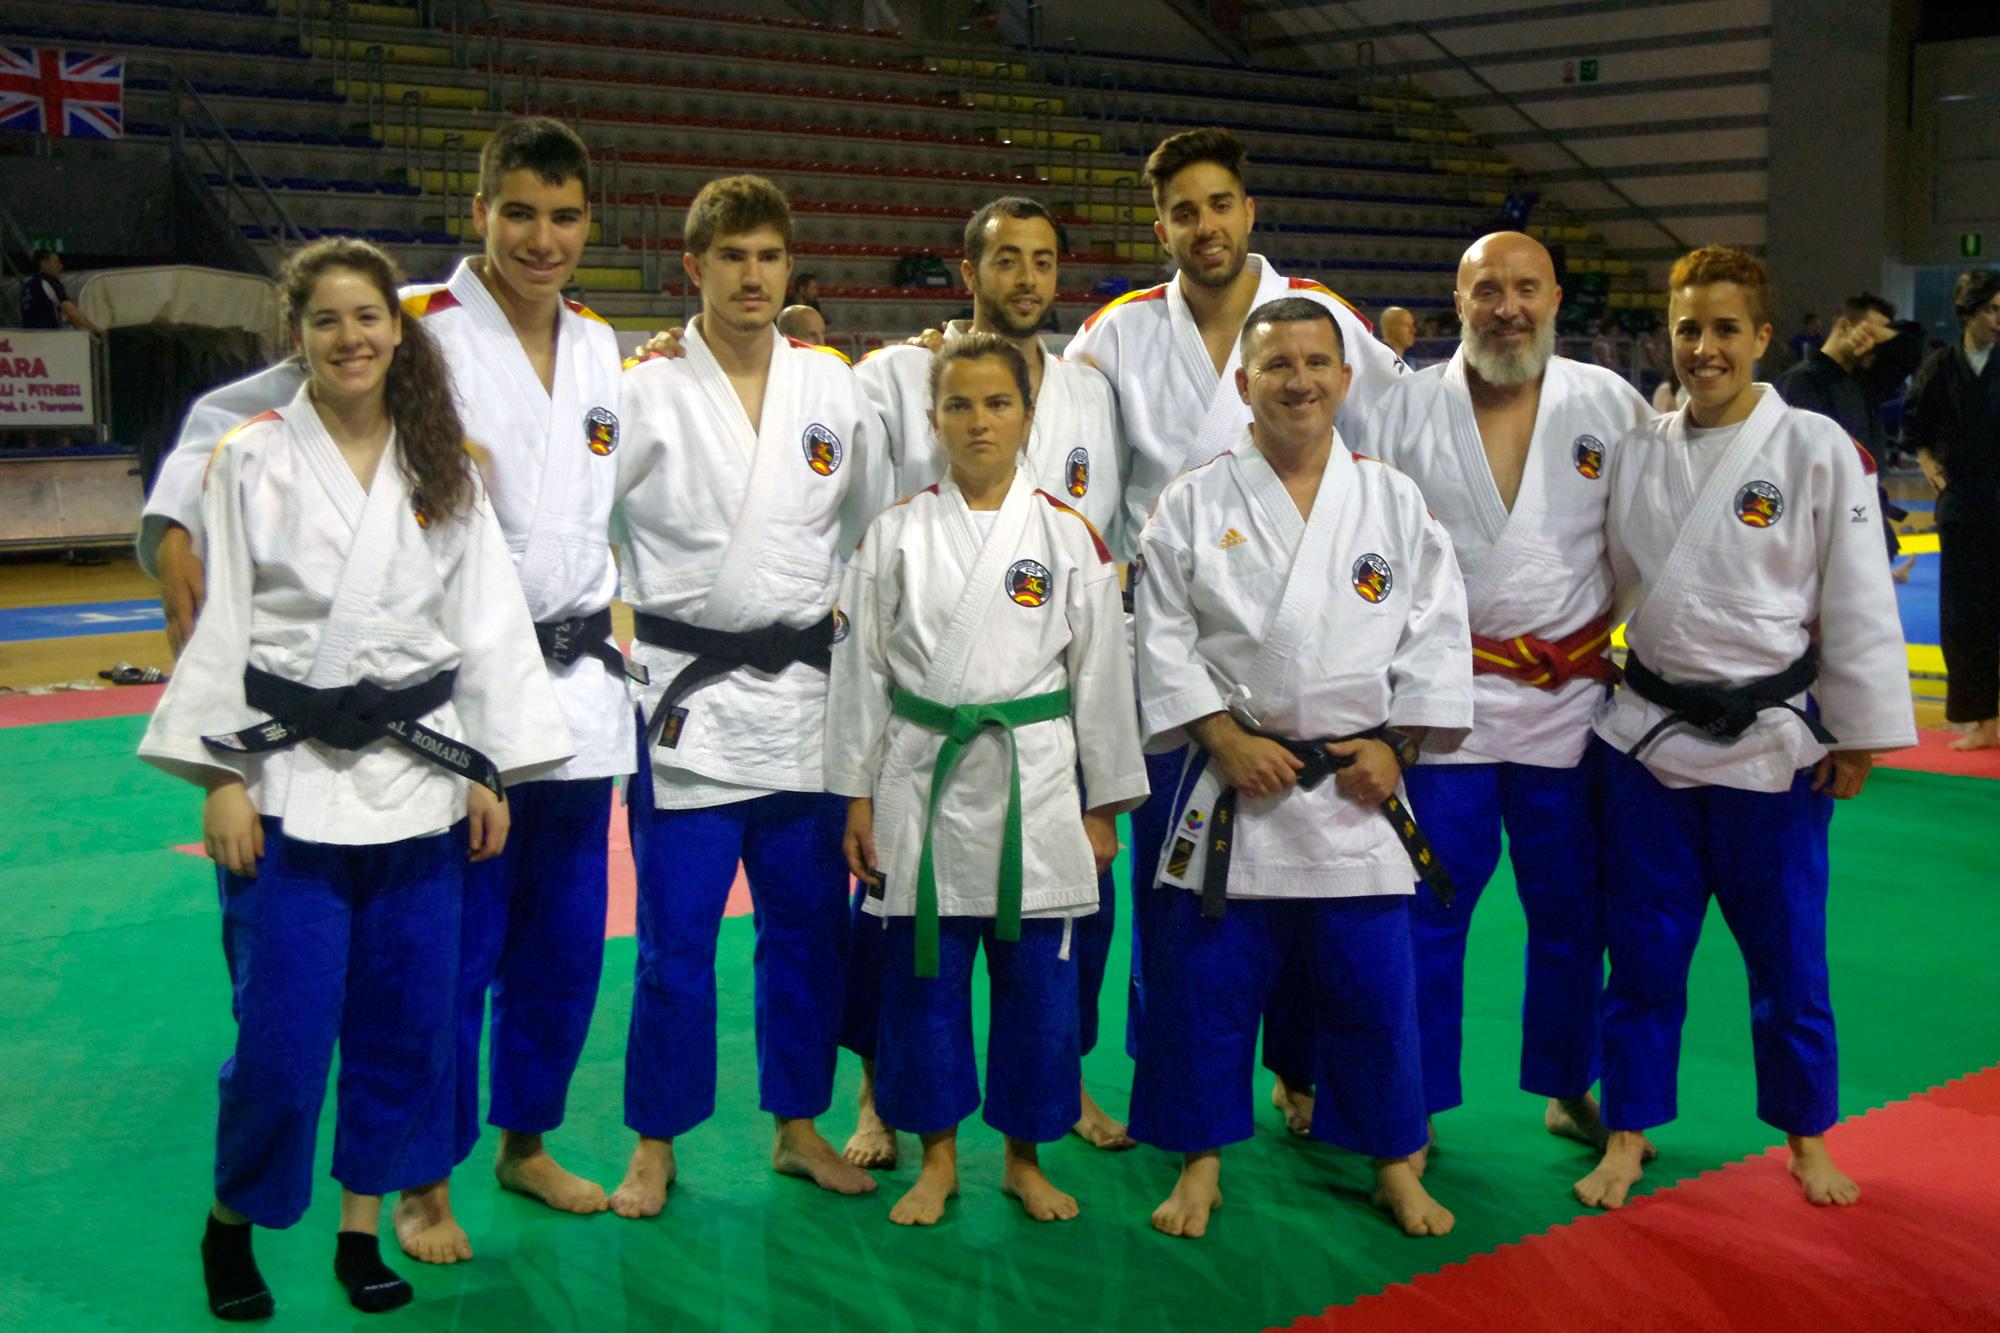 Equipo Español EC Random Attacks - Taranto Mayo 2016